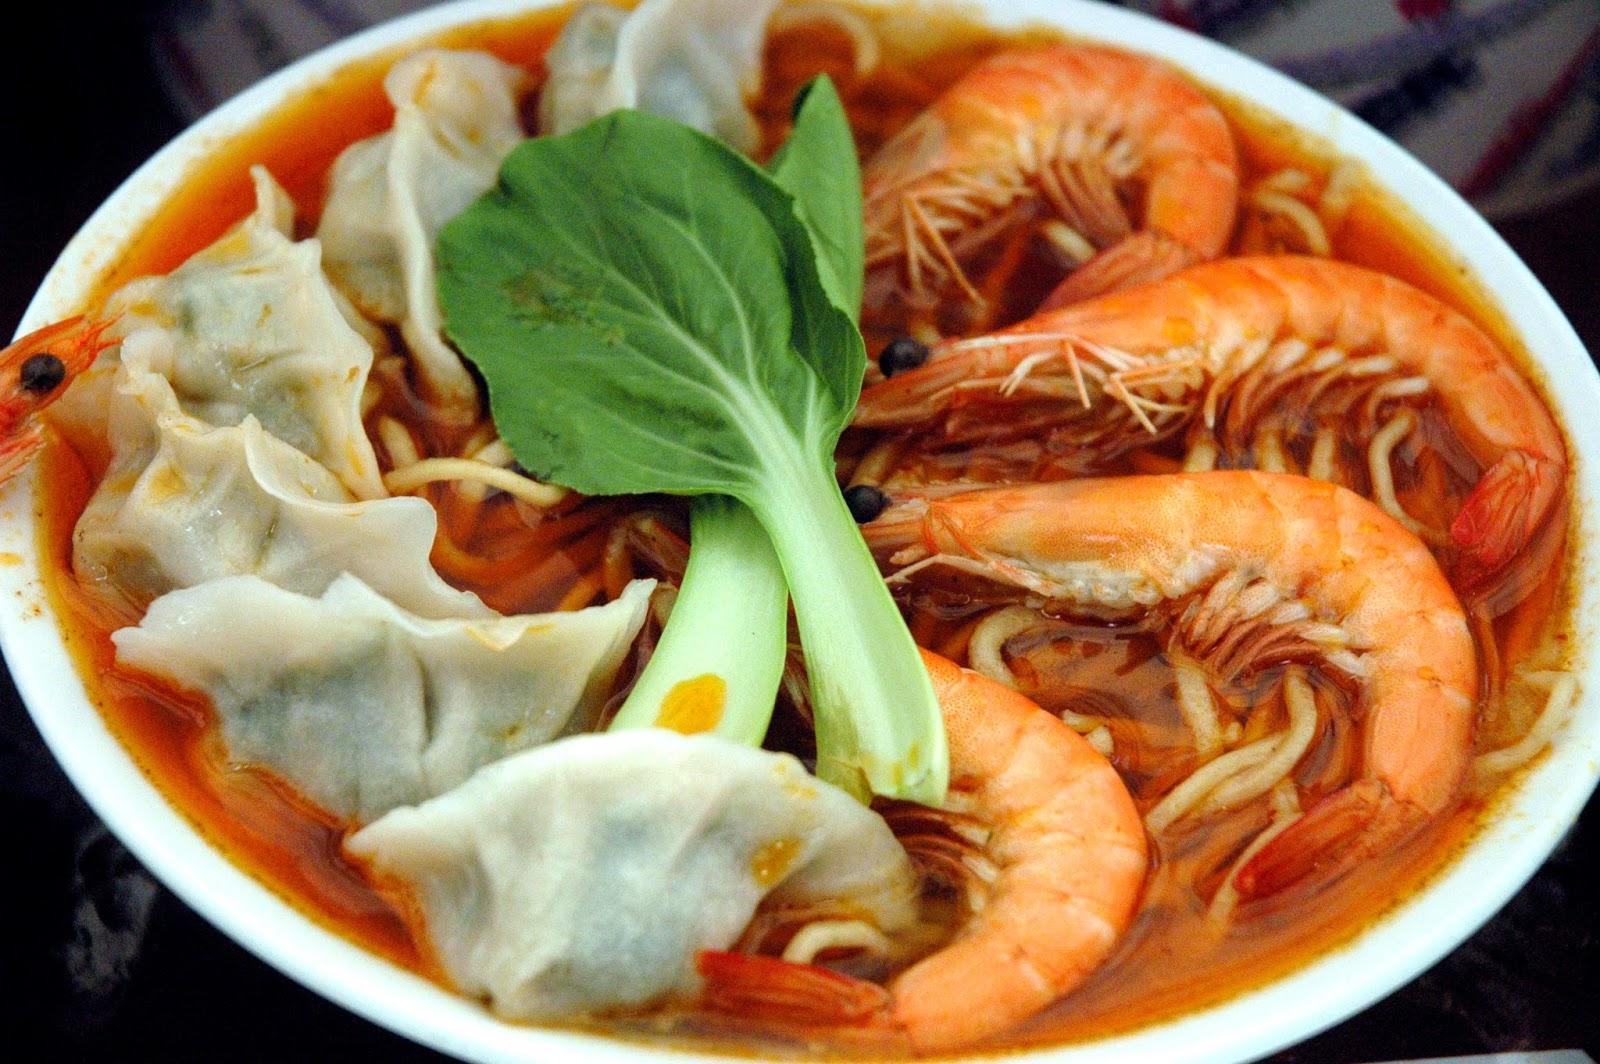 Chinatown Food Tour New York